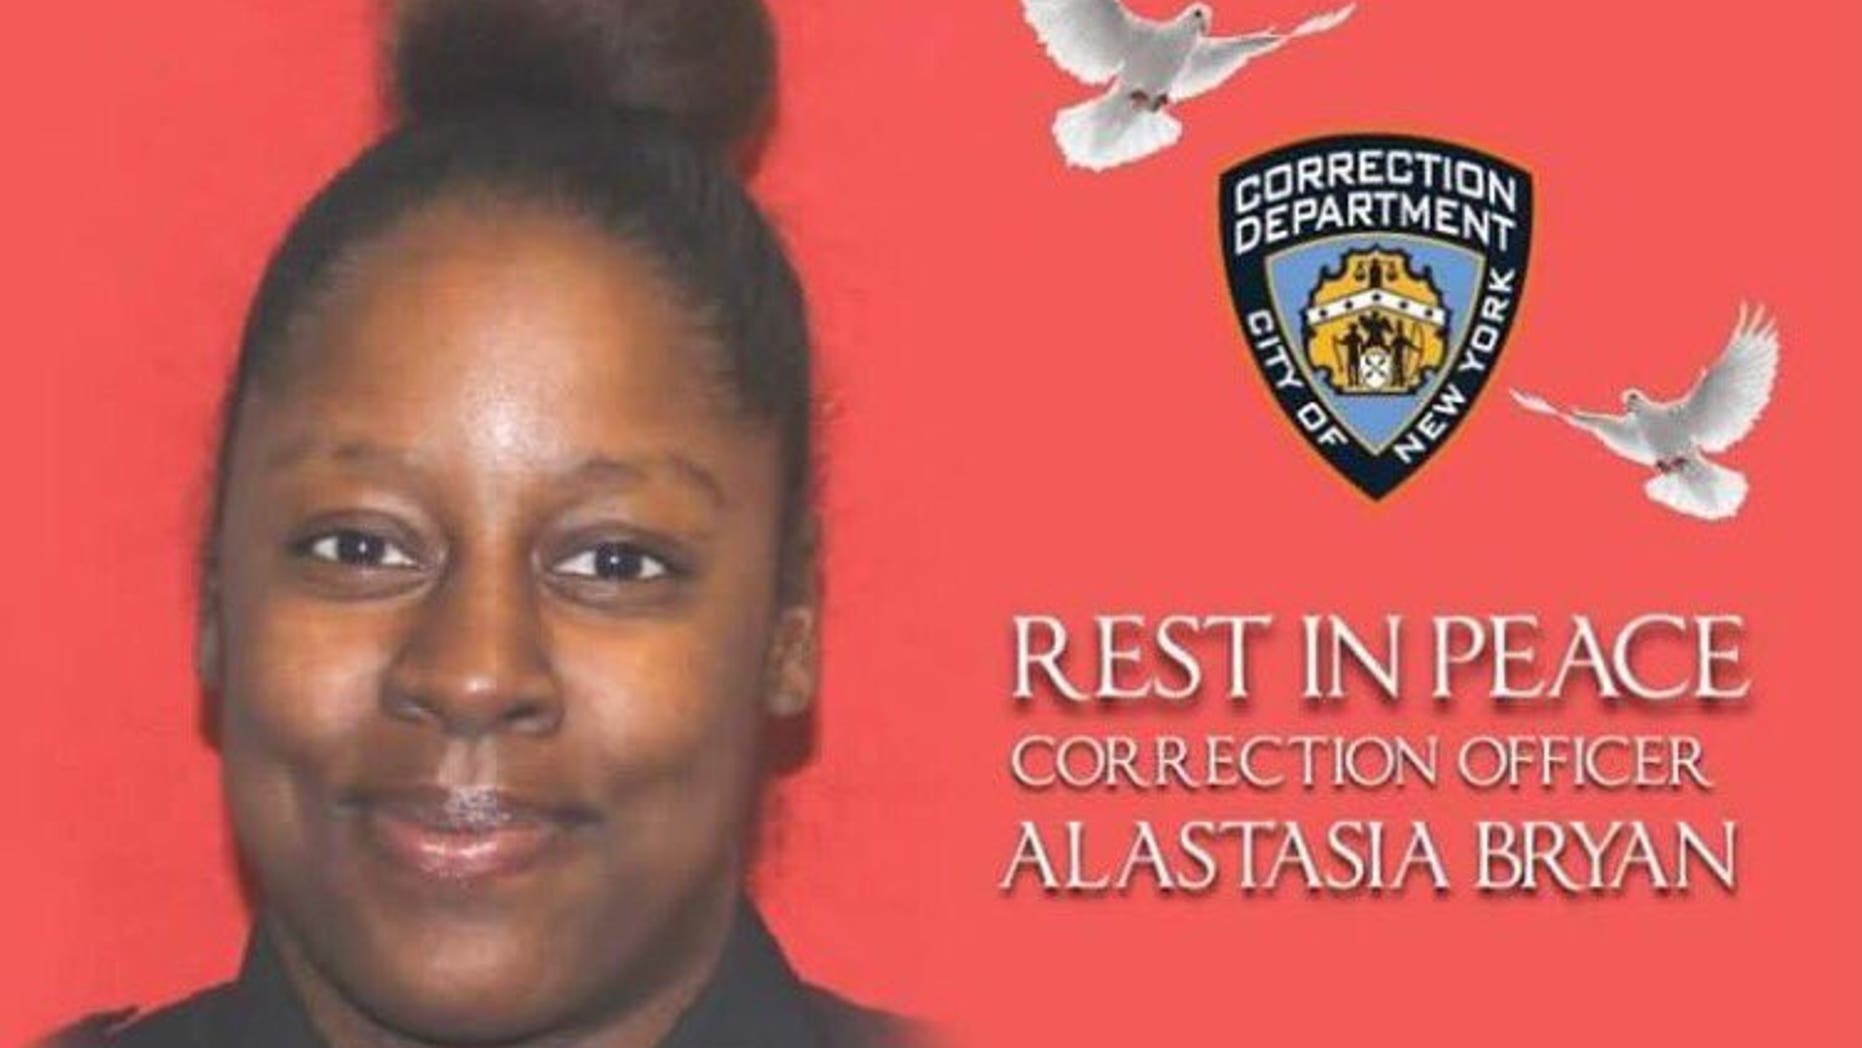 A tribute image to Alastasia Bryan.